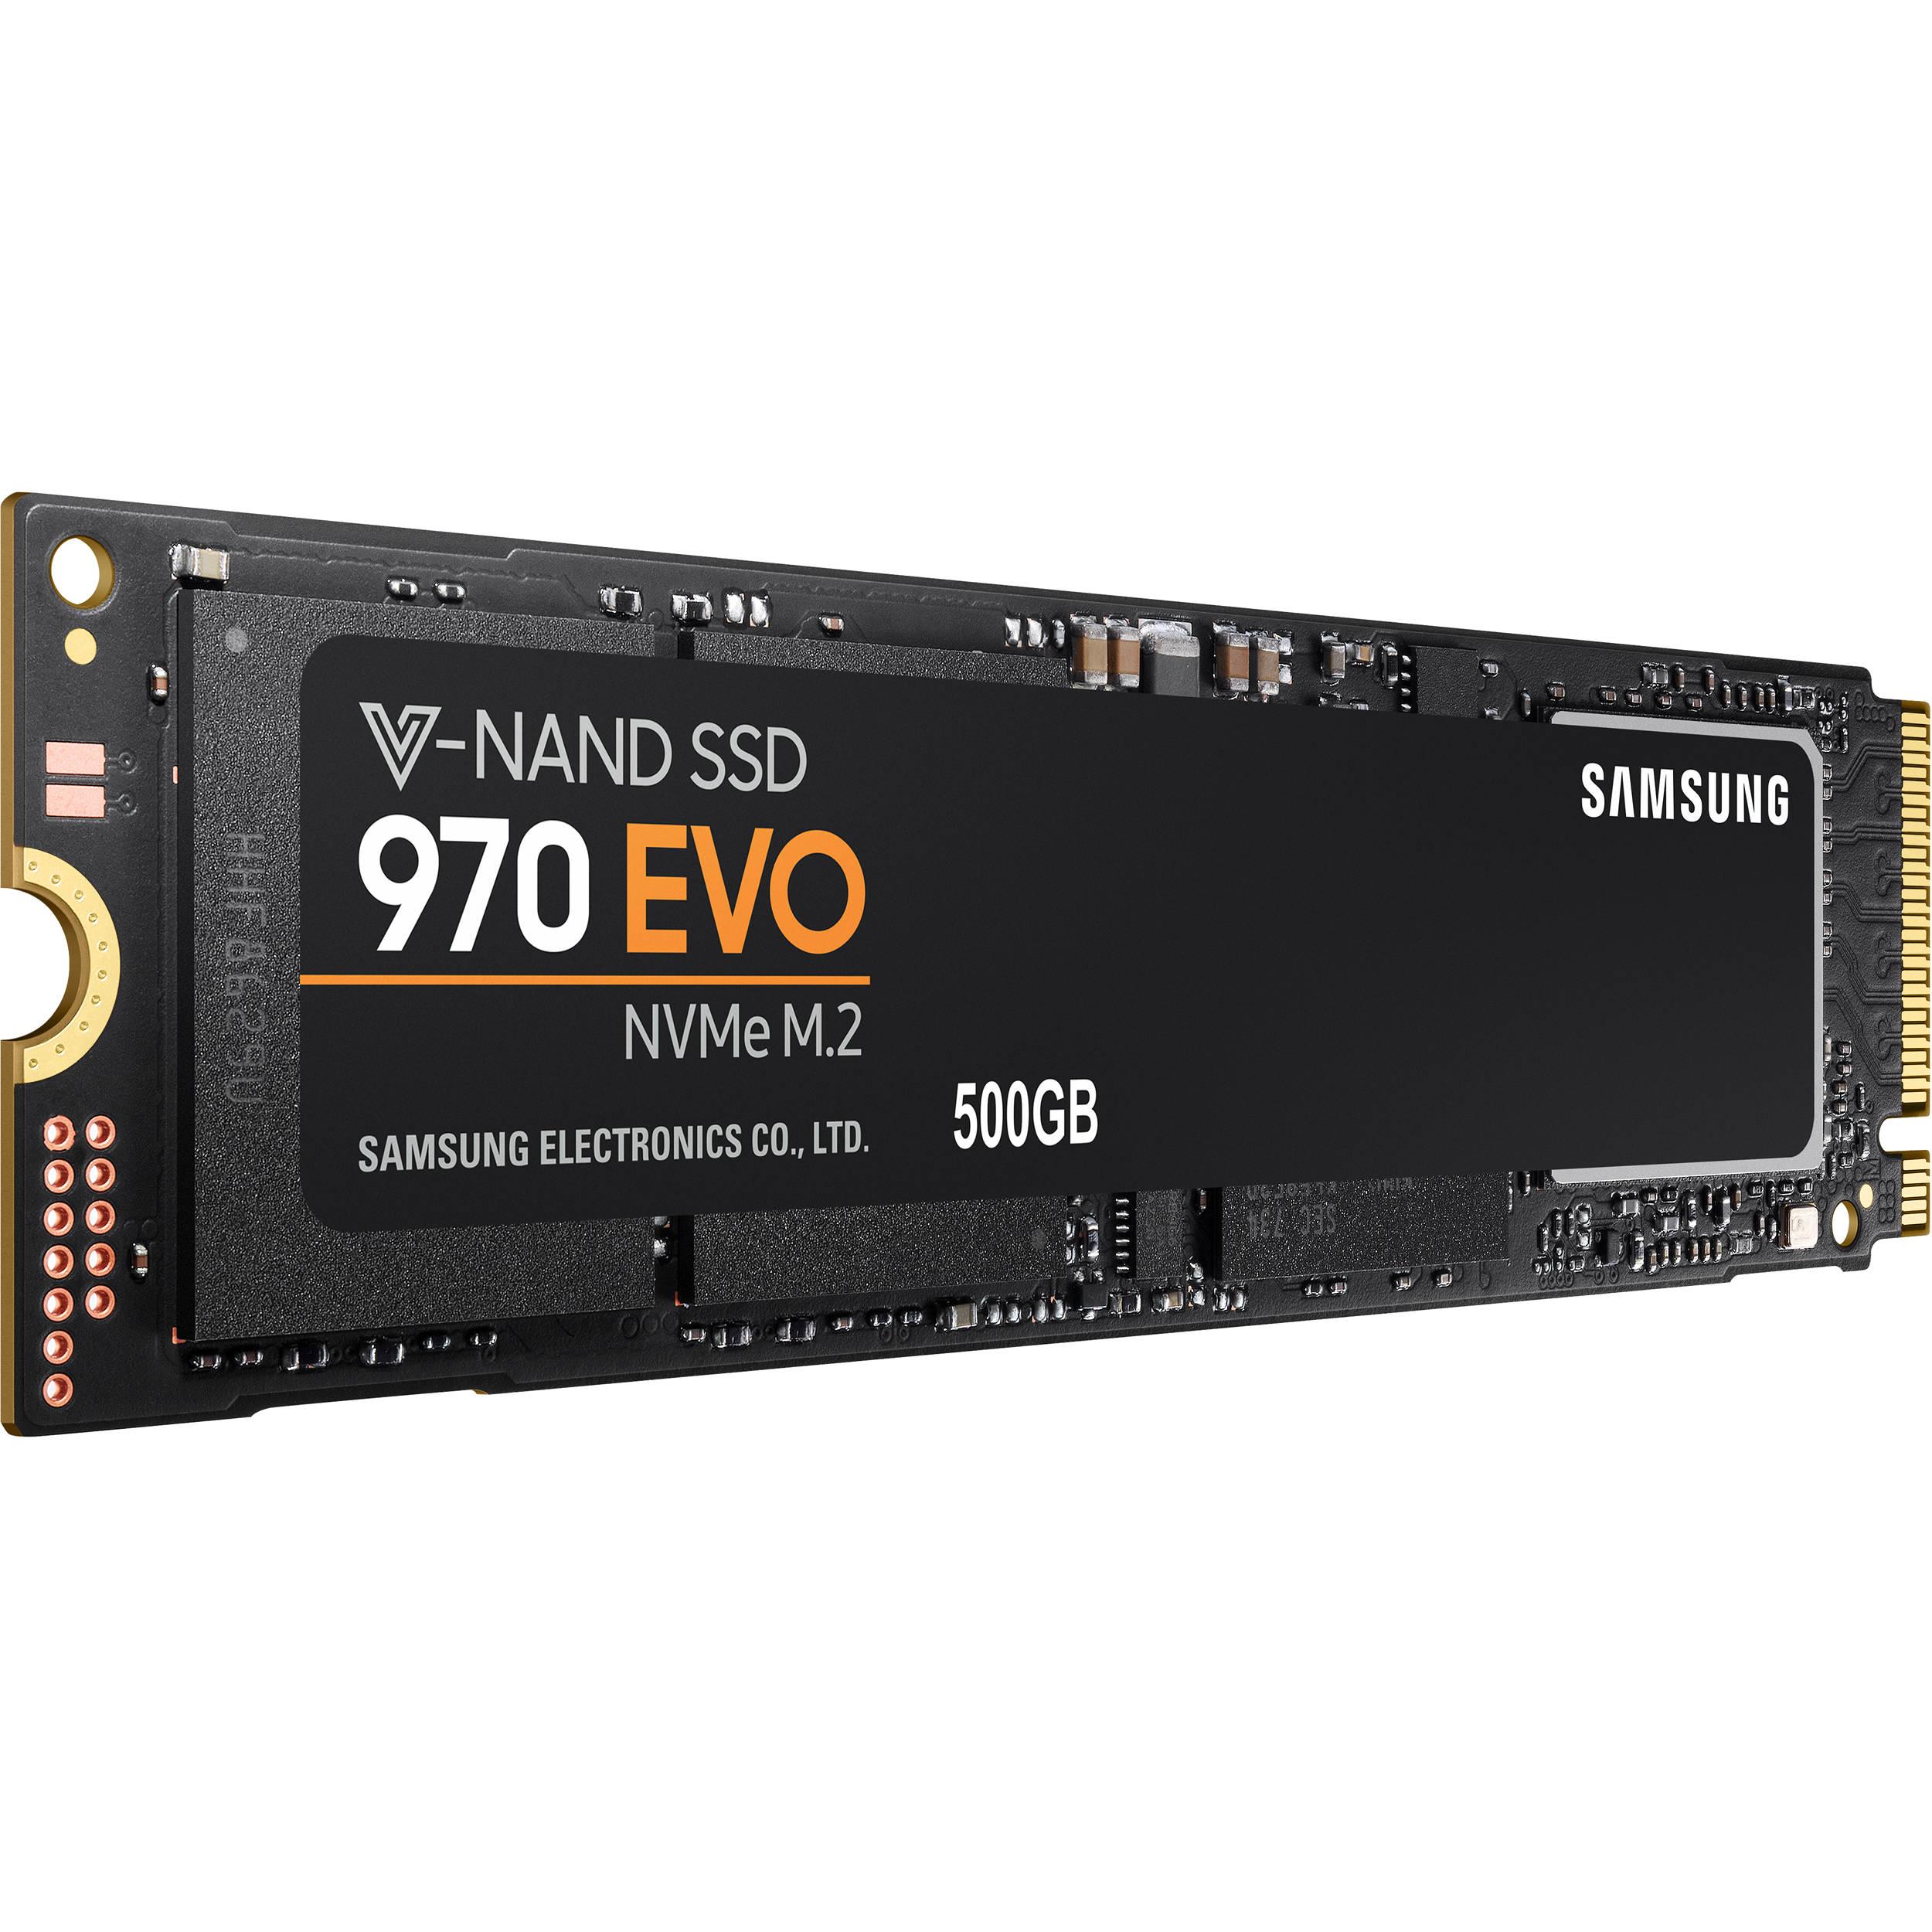 Samsung 970 Evo 500GB V-NAND M.2 SSD - £159.98 @ Ebuyer